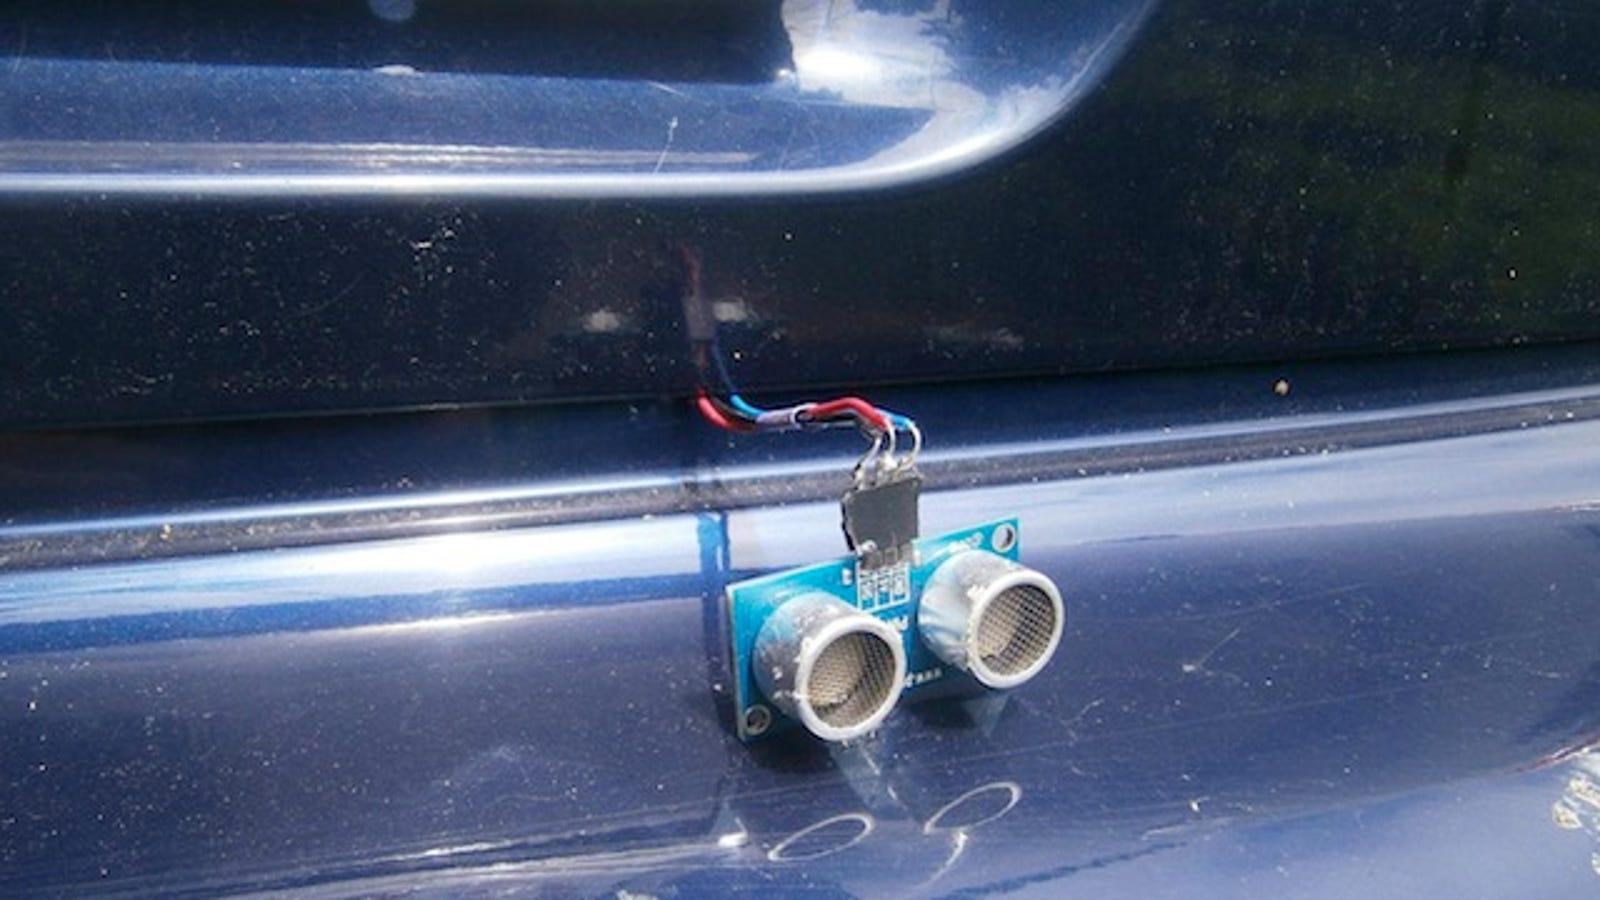 Diy sonic distance sensors to improve your parallel parking solutioingenieria Gallery